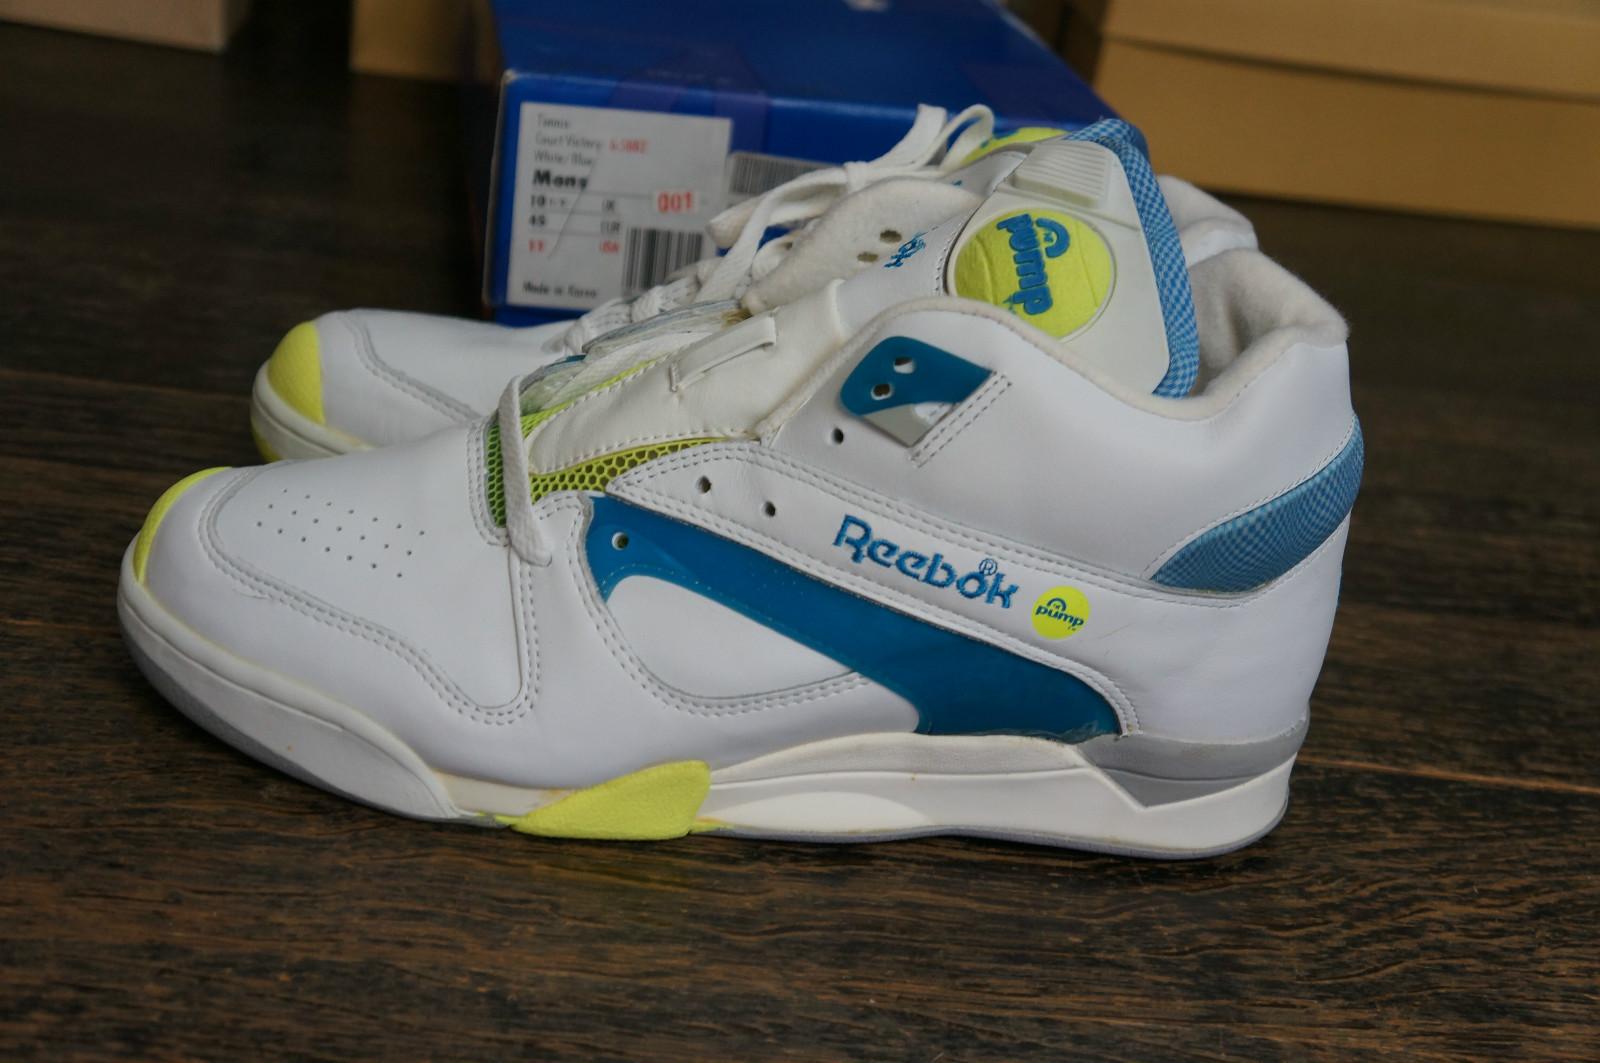 Pompe Reebok Tennis De Ebay azNAD